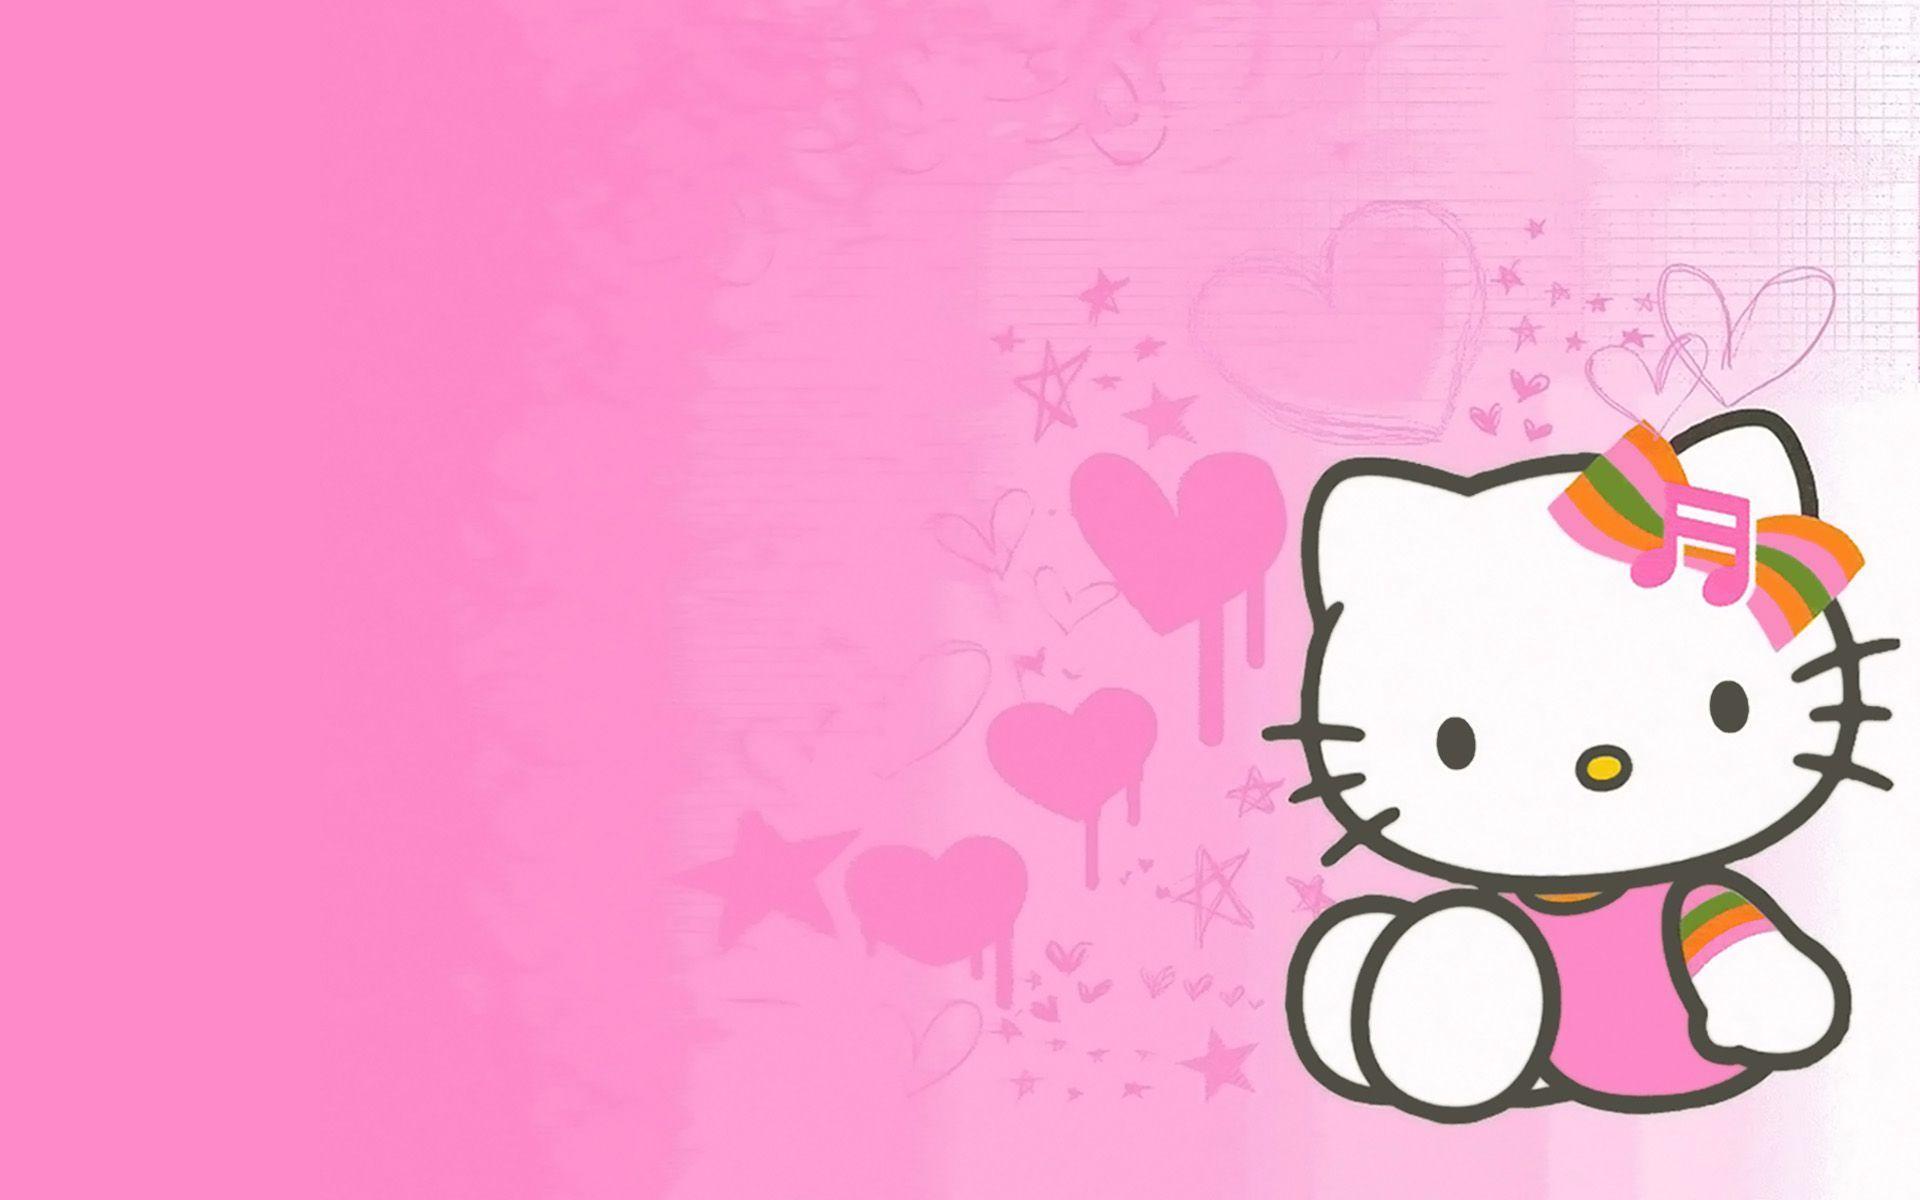 Cool Wallpaper Hello Kitty Desktop Background - 5da9fb11a6b33effdc8ad17b76eaa5de  Pictures_23842.jpg